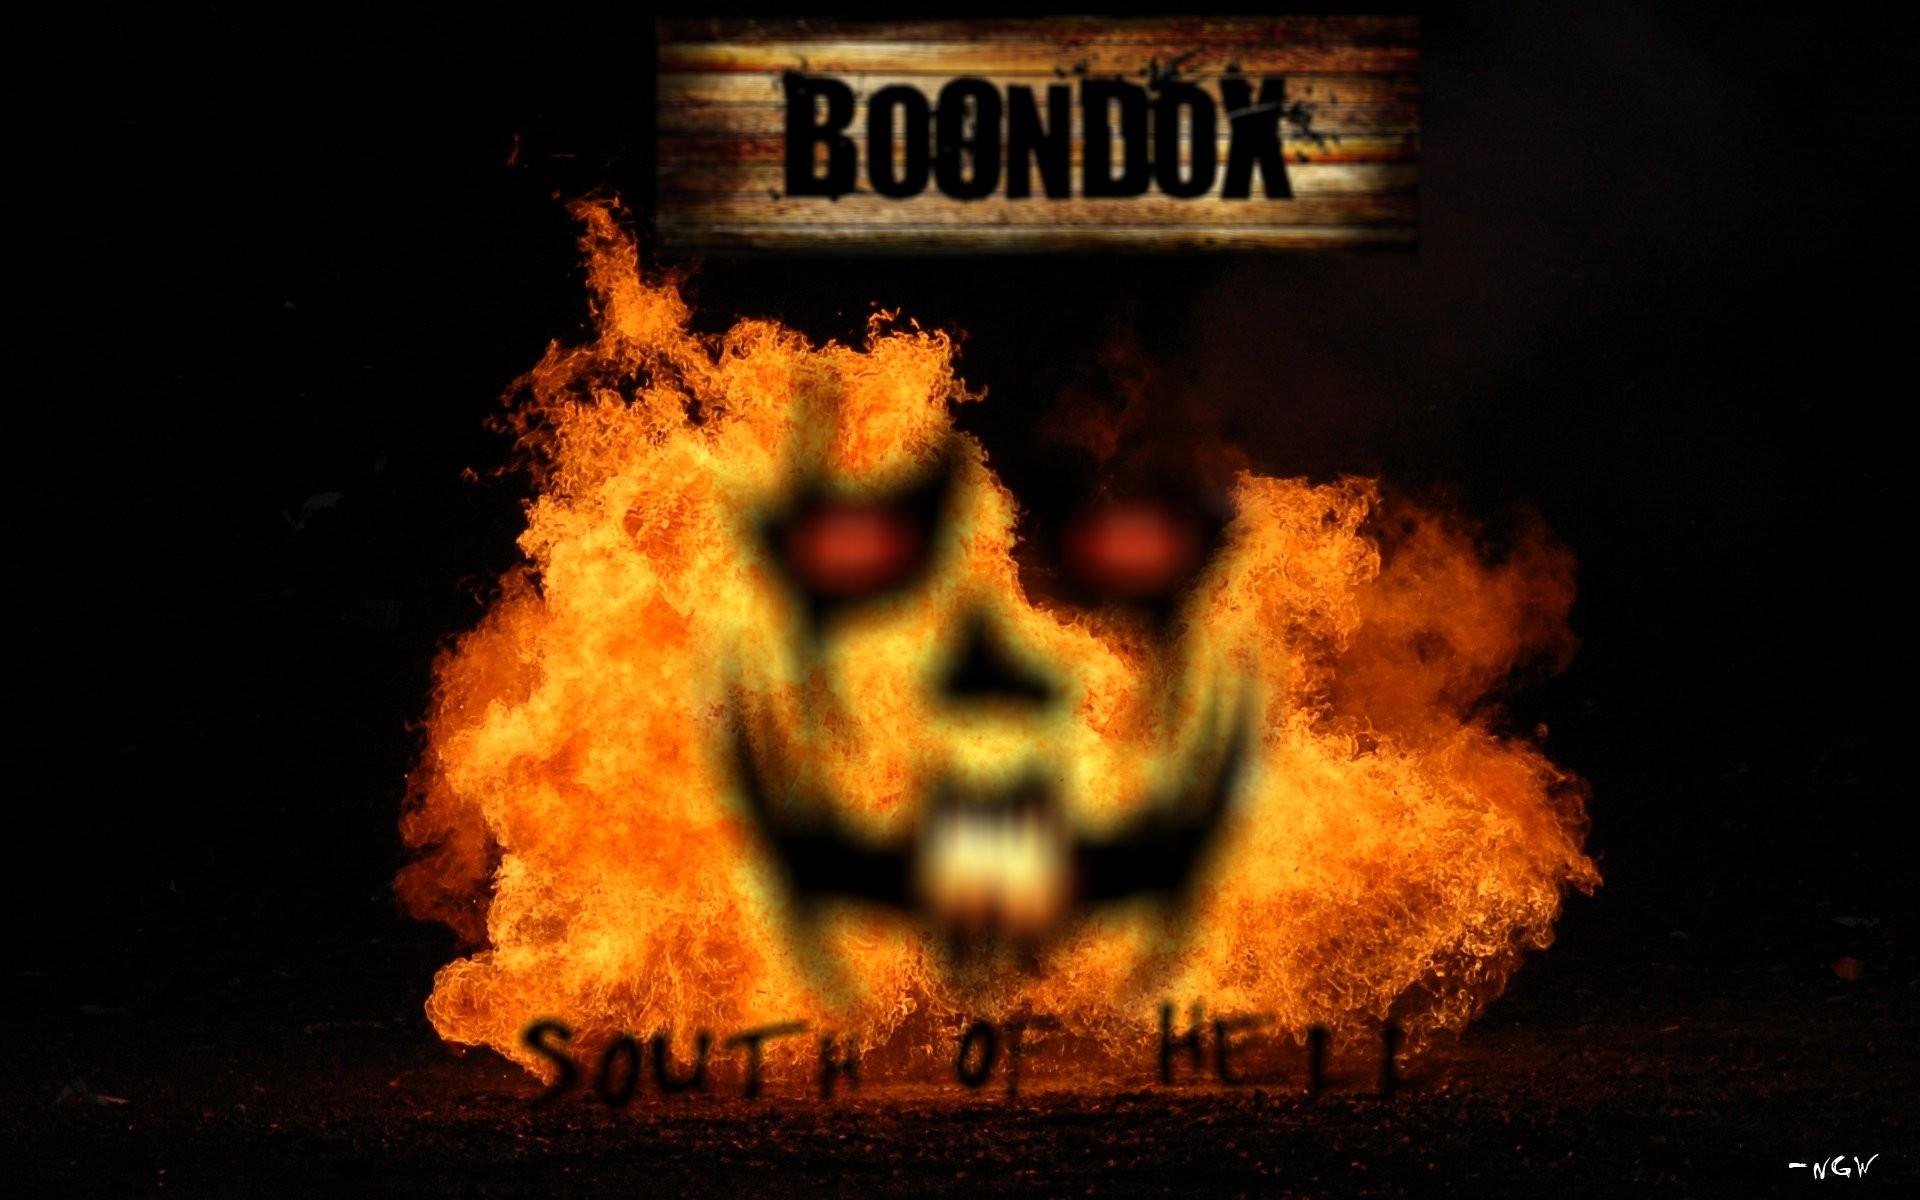 Boondox South of Hell Wallppr by theNGW on DeviantArt